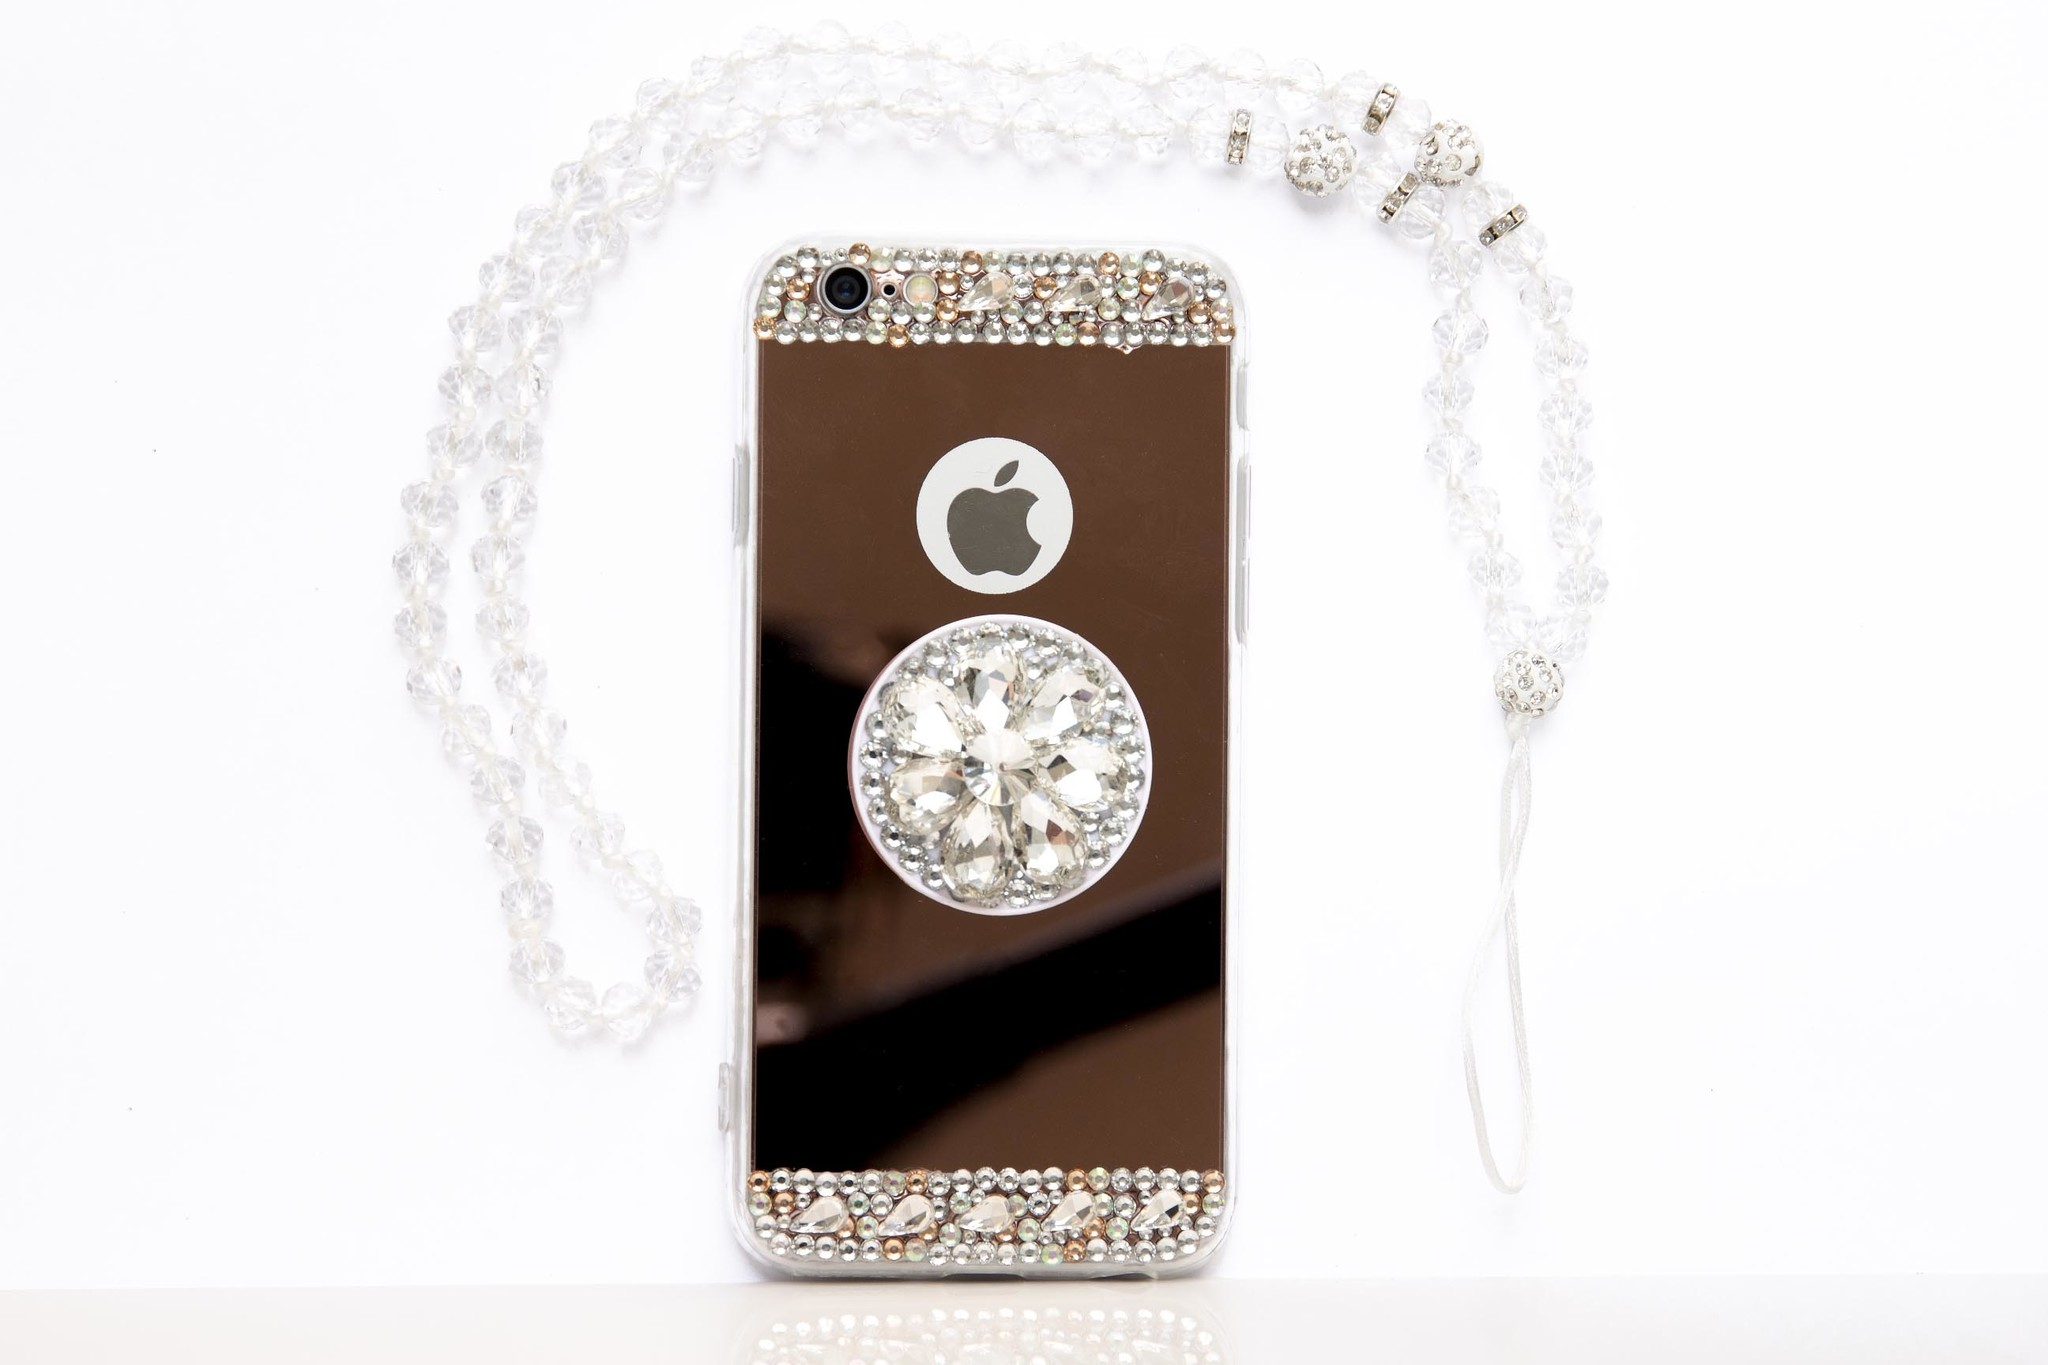 Smartphonehoesje iPhone 7 / 8 | Bling (met ketting) | Goud / roze